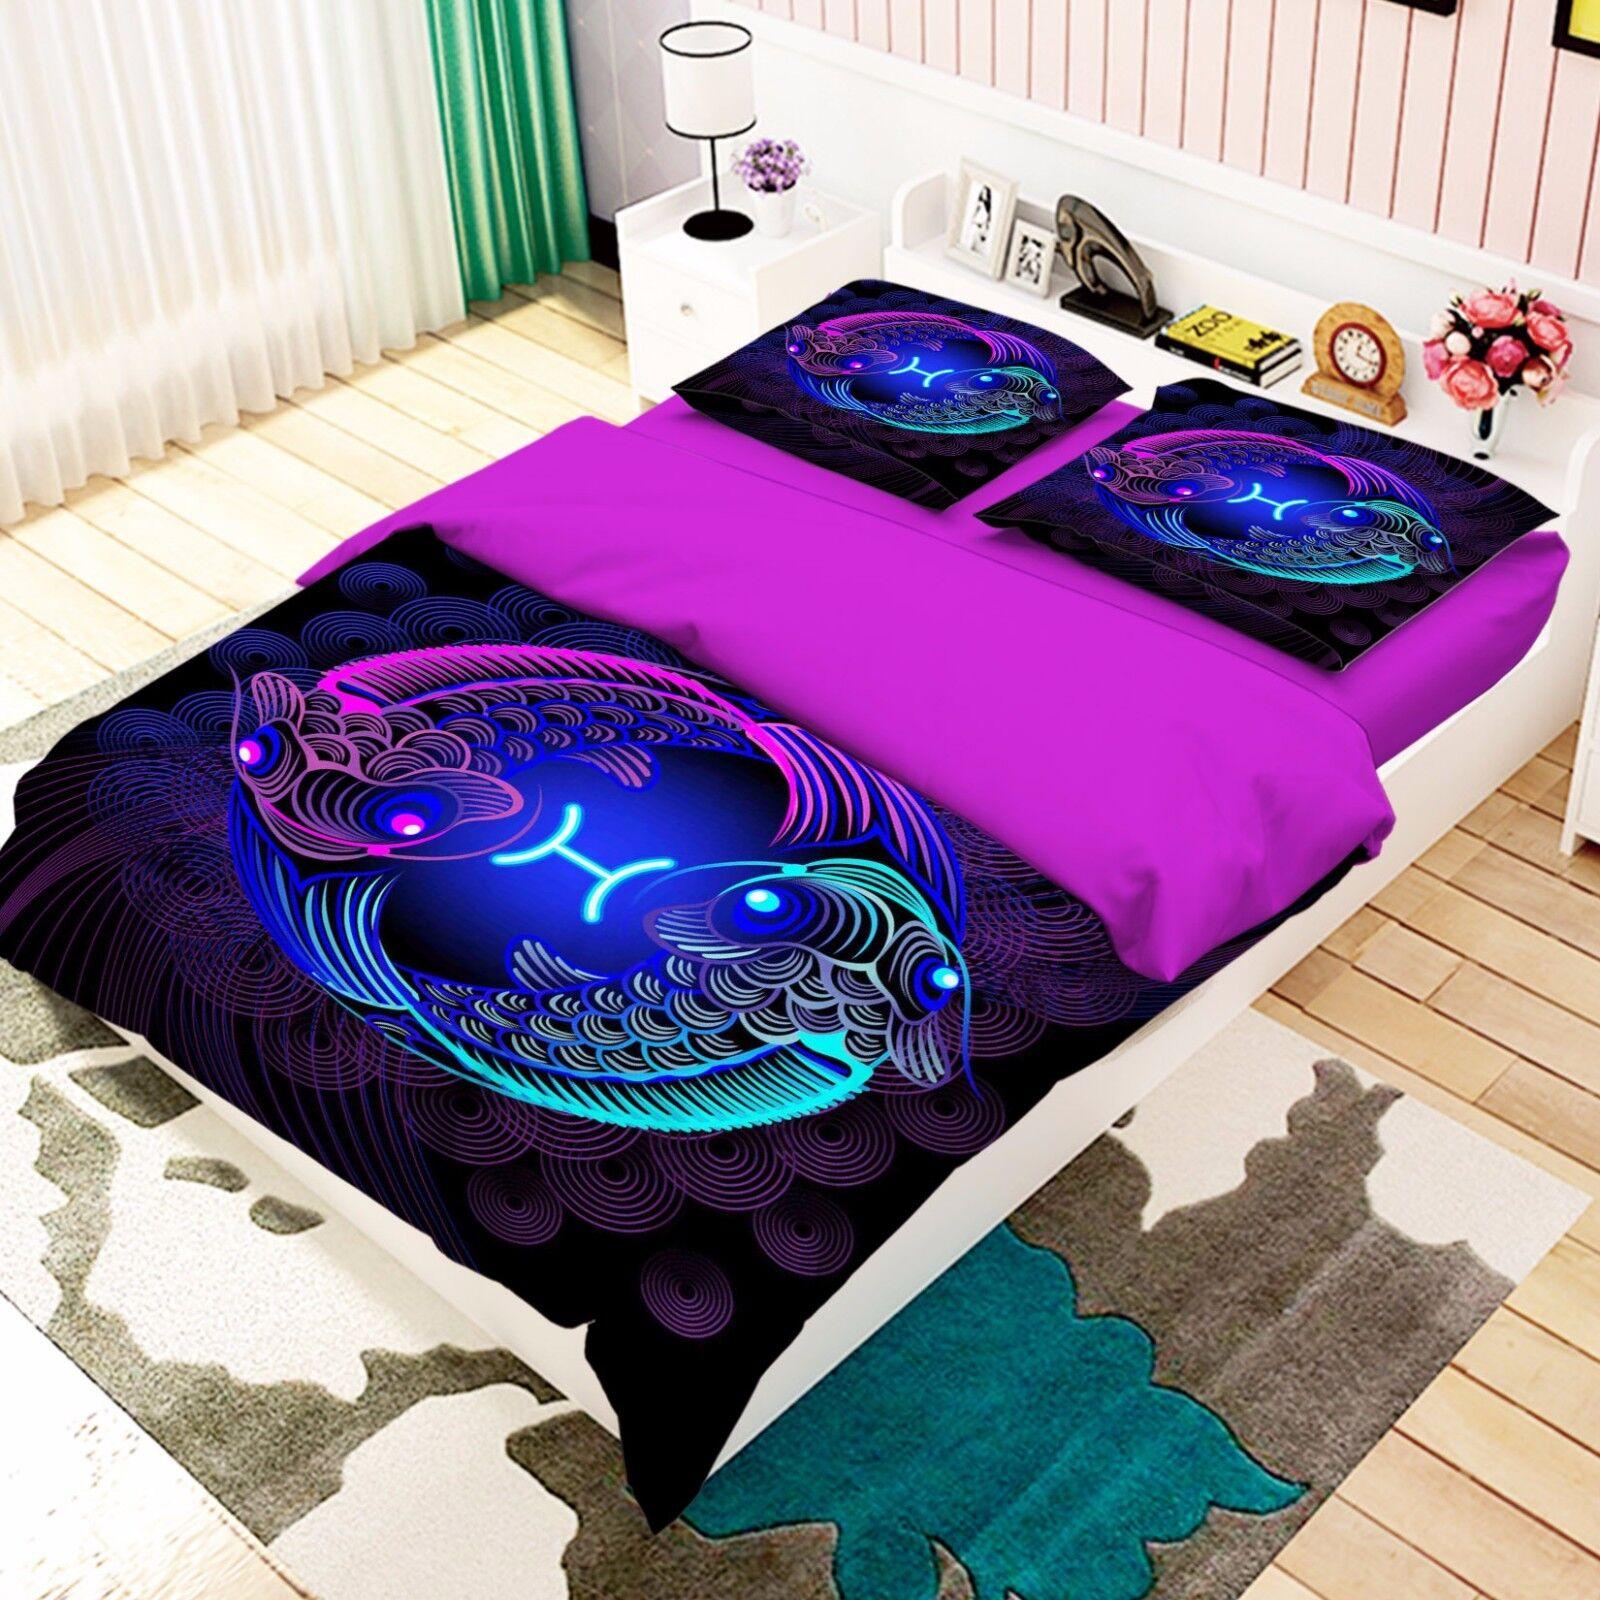 3D Pisces 197 Bett Pillowcases Quilt Duvet Startseite Set Single Königin König Größe AU